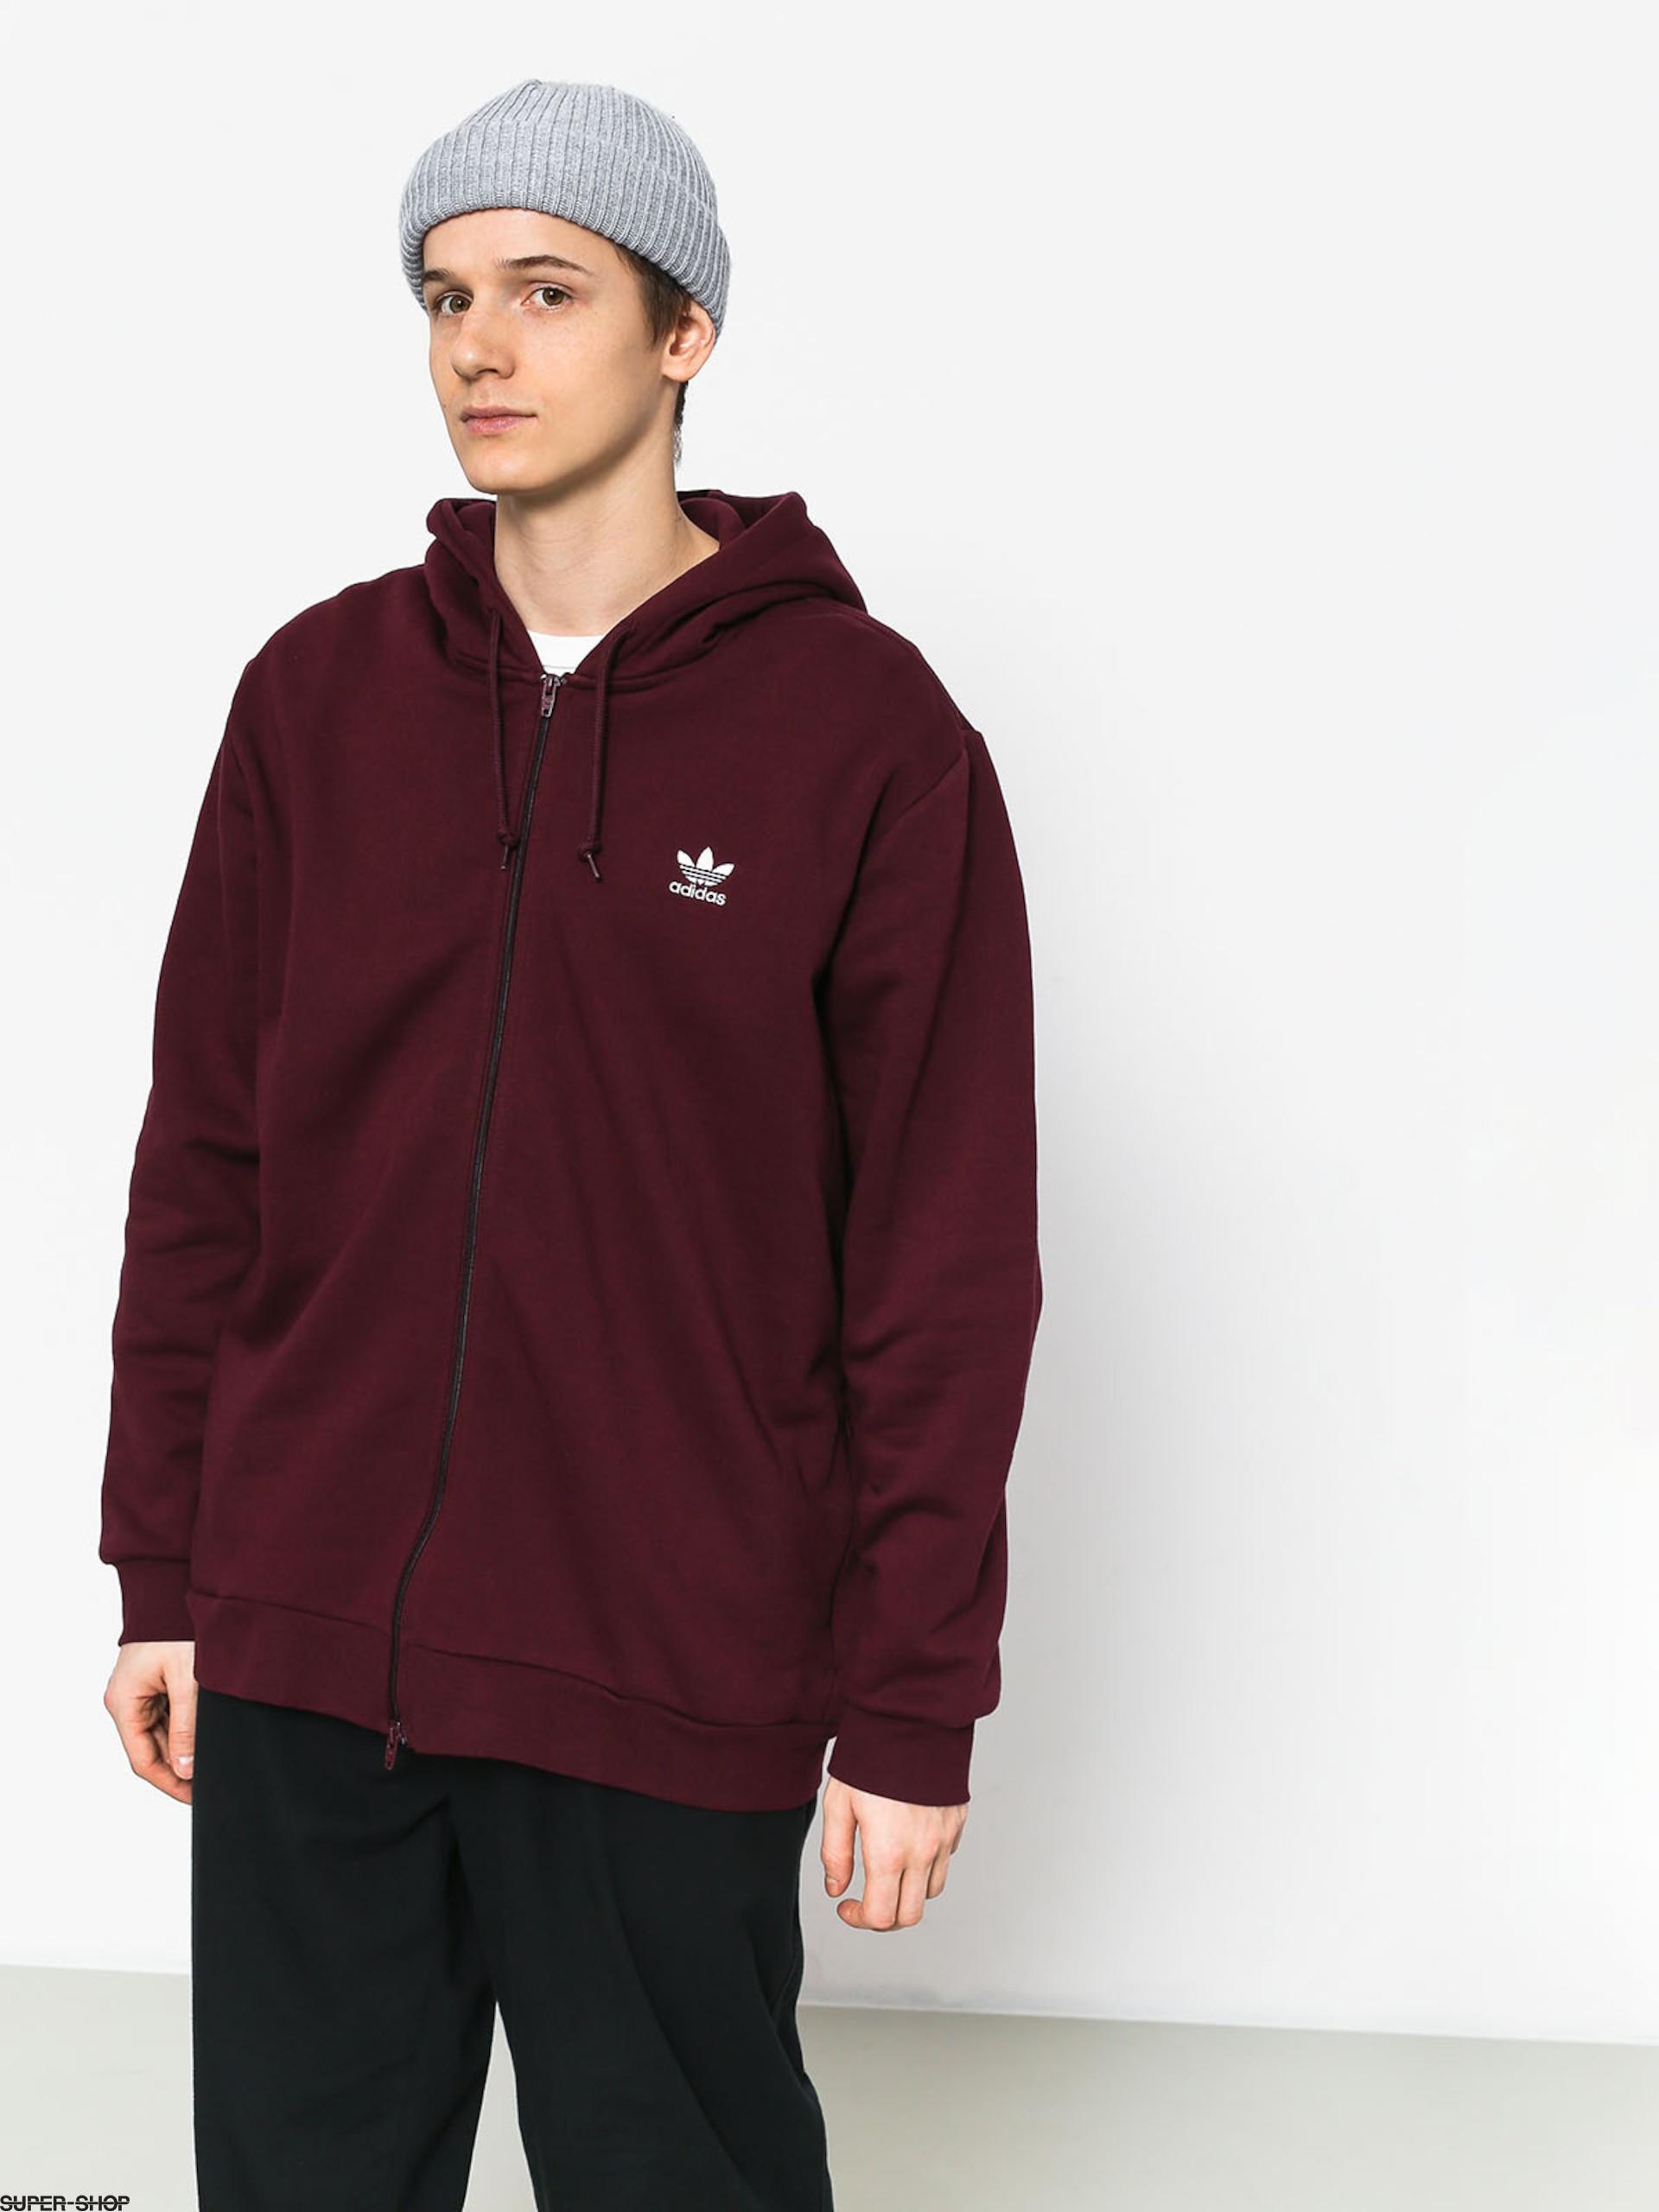 adidas TRF W sweater maroon white